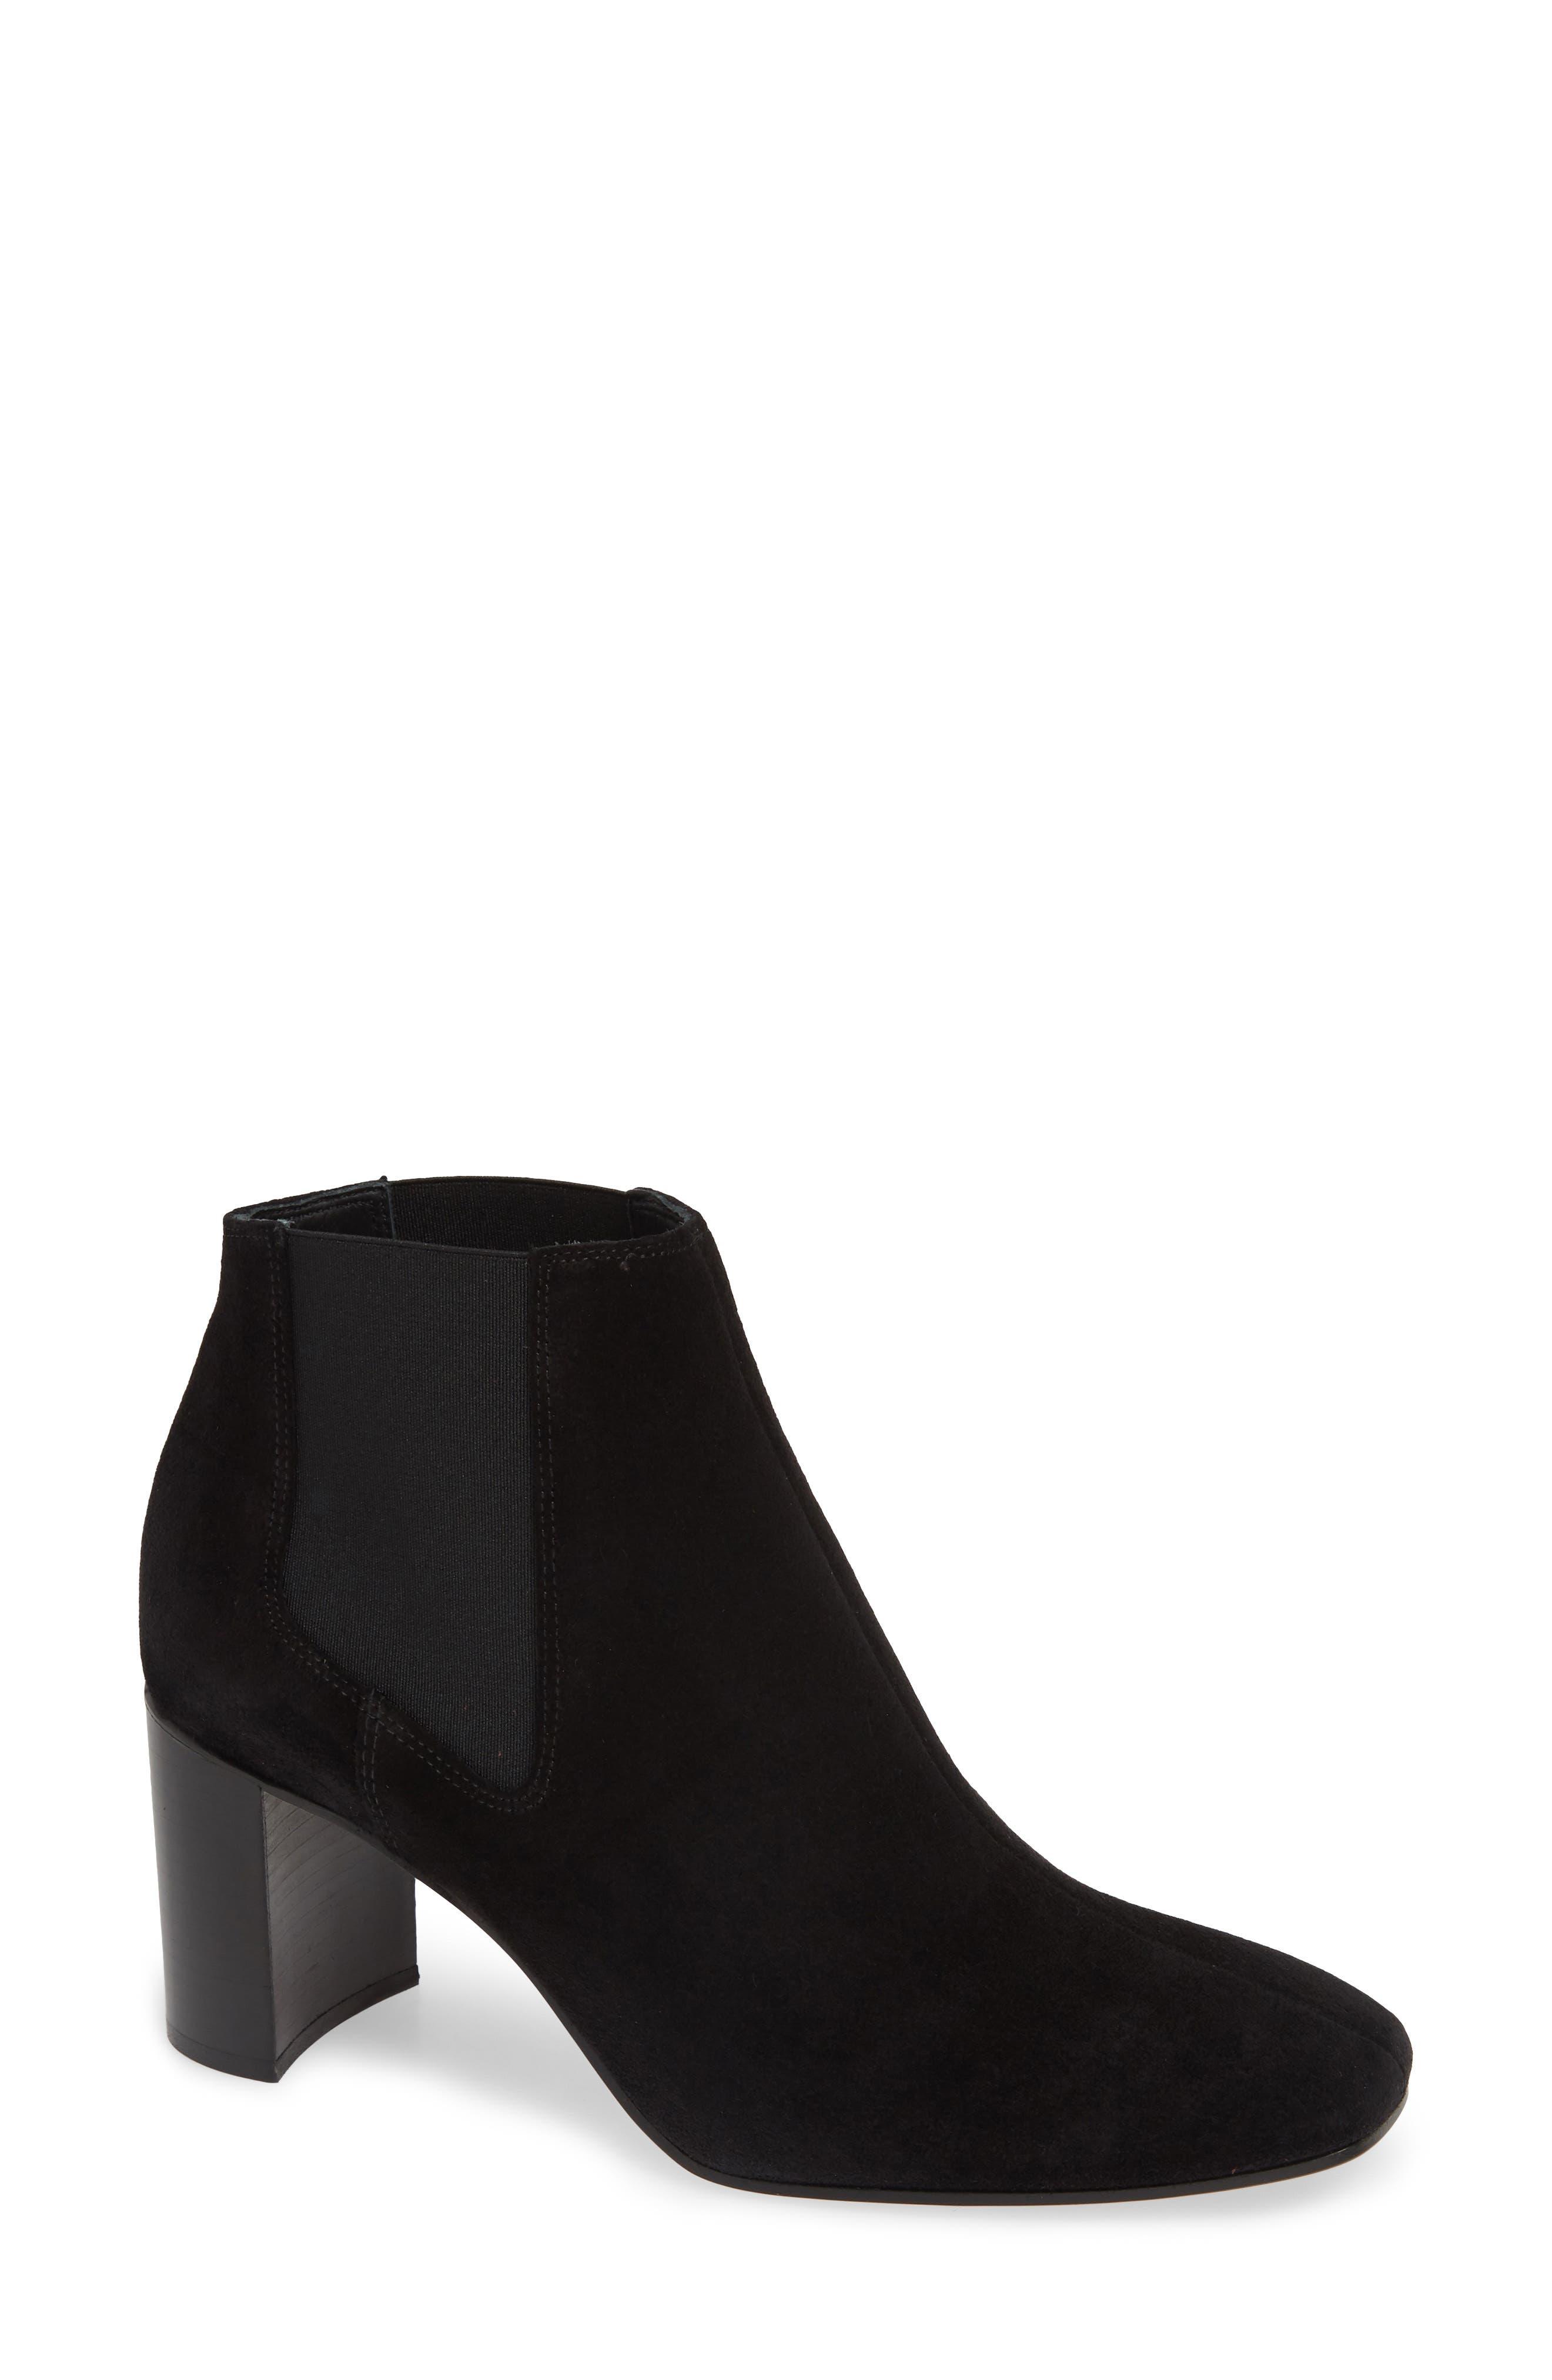 Rag & Bone Asleen Boot, Black